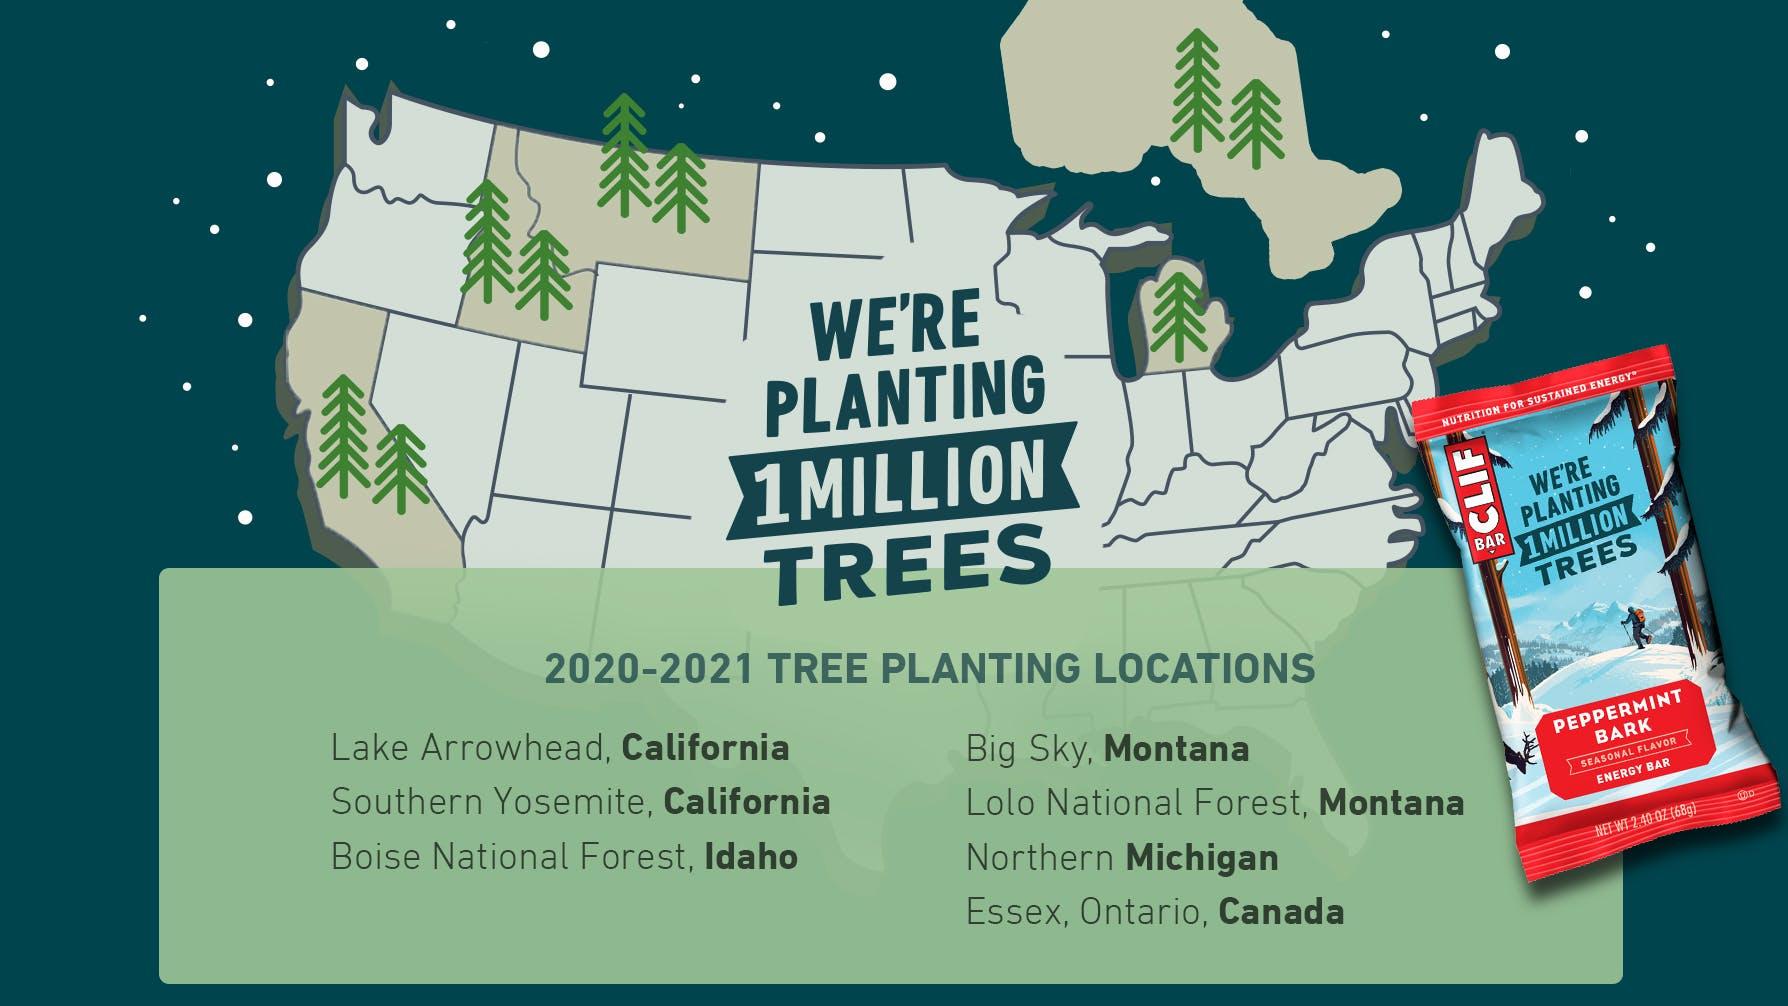 2020 2021 Tree planting locations